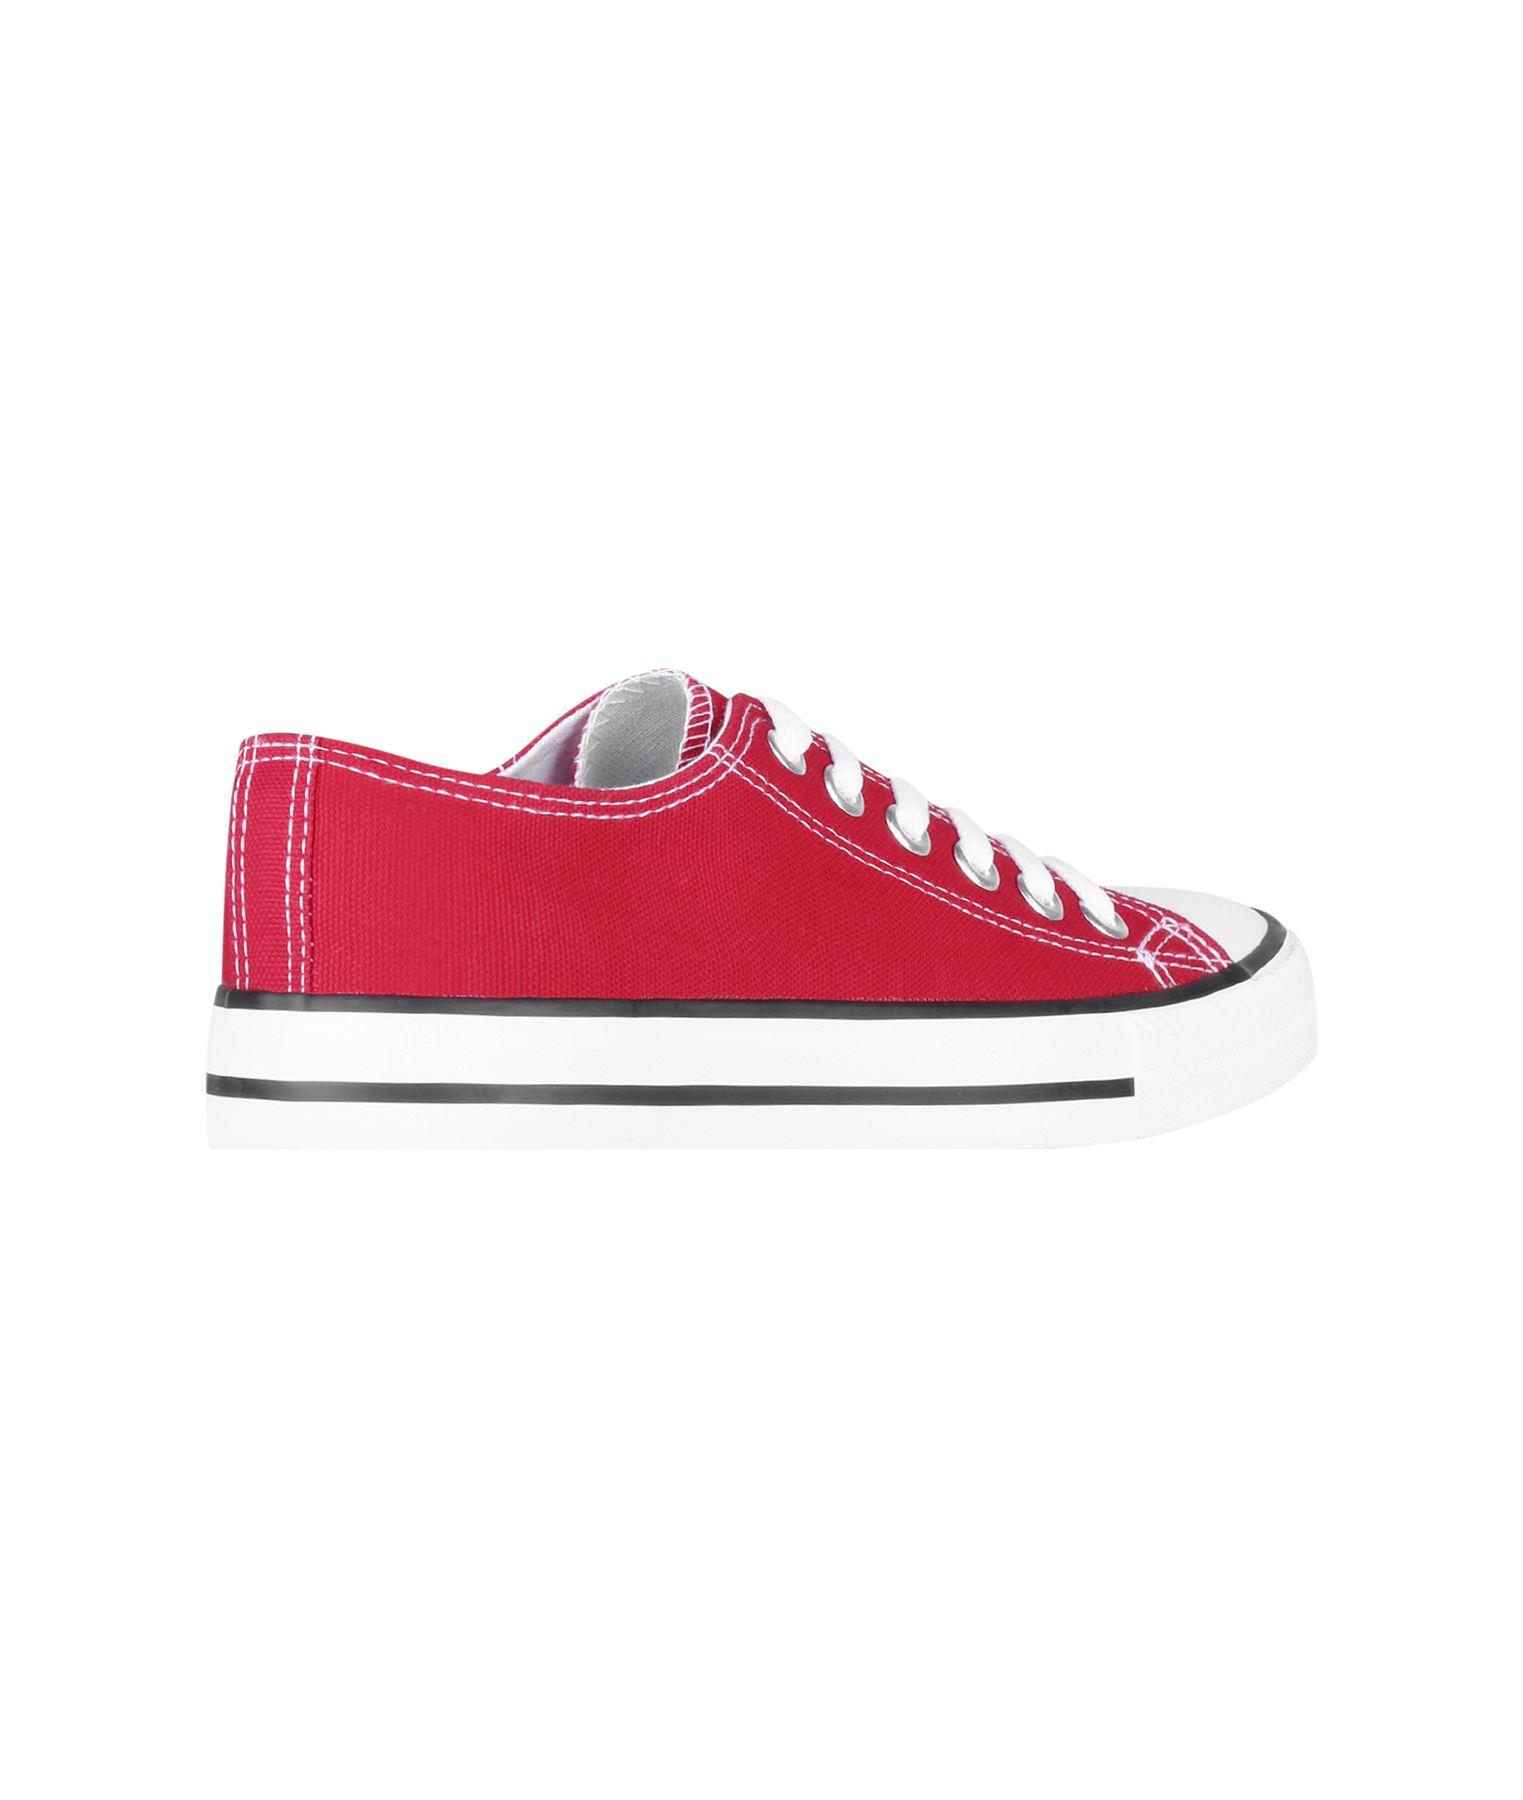 Zapatillas-Mujer-Casuales-Deportiva-Barata-Lona-Moda-Originales-Outlet-Tela-Moda miniatura 39